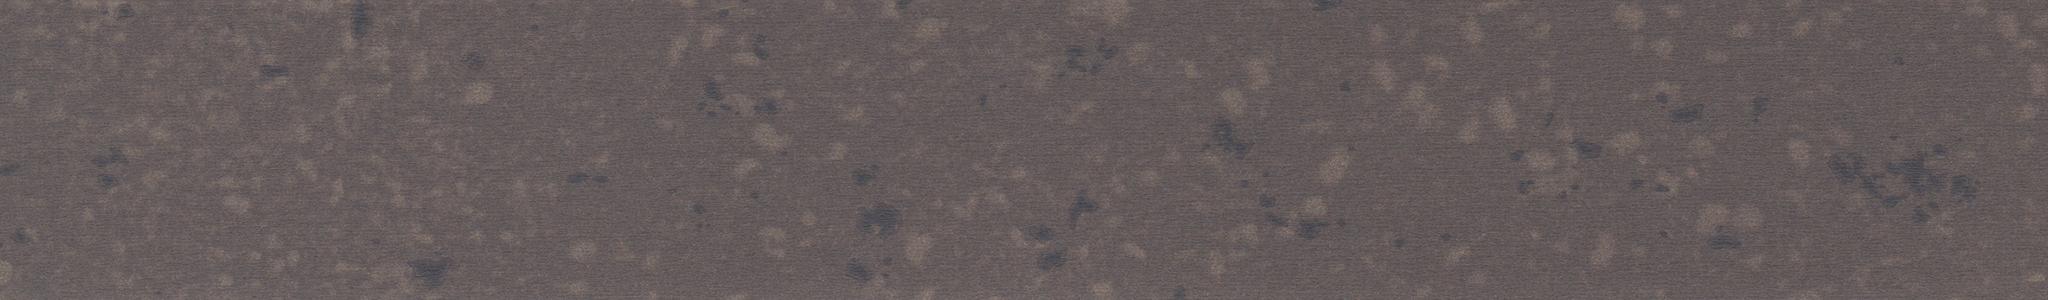 HD 296146 ABS Edge Terazzo Bronz Smooth Softmatt